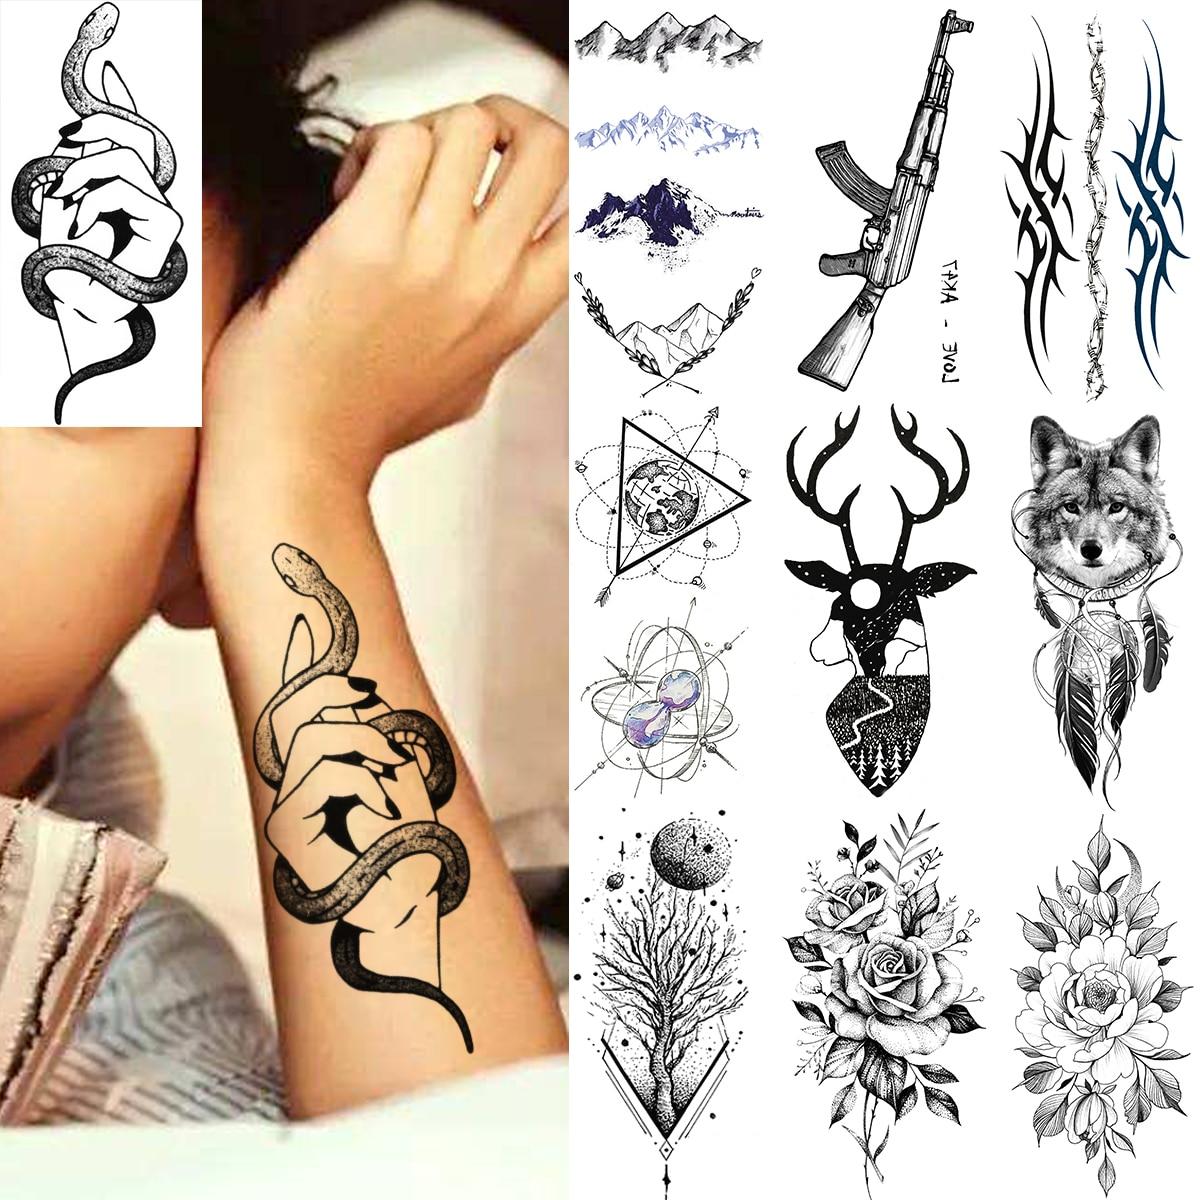 Sexy Hand Snake Adults Temporary Tattoos For Men Women Gun Thorns